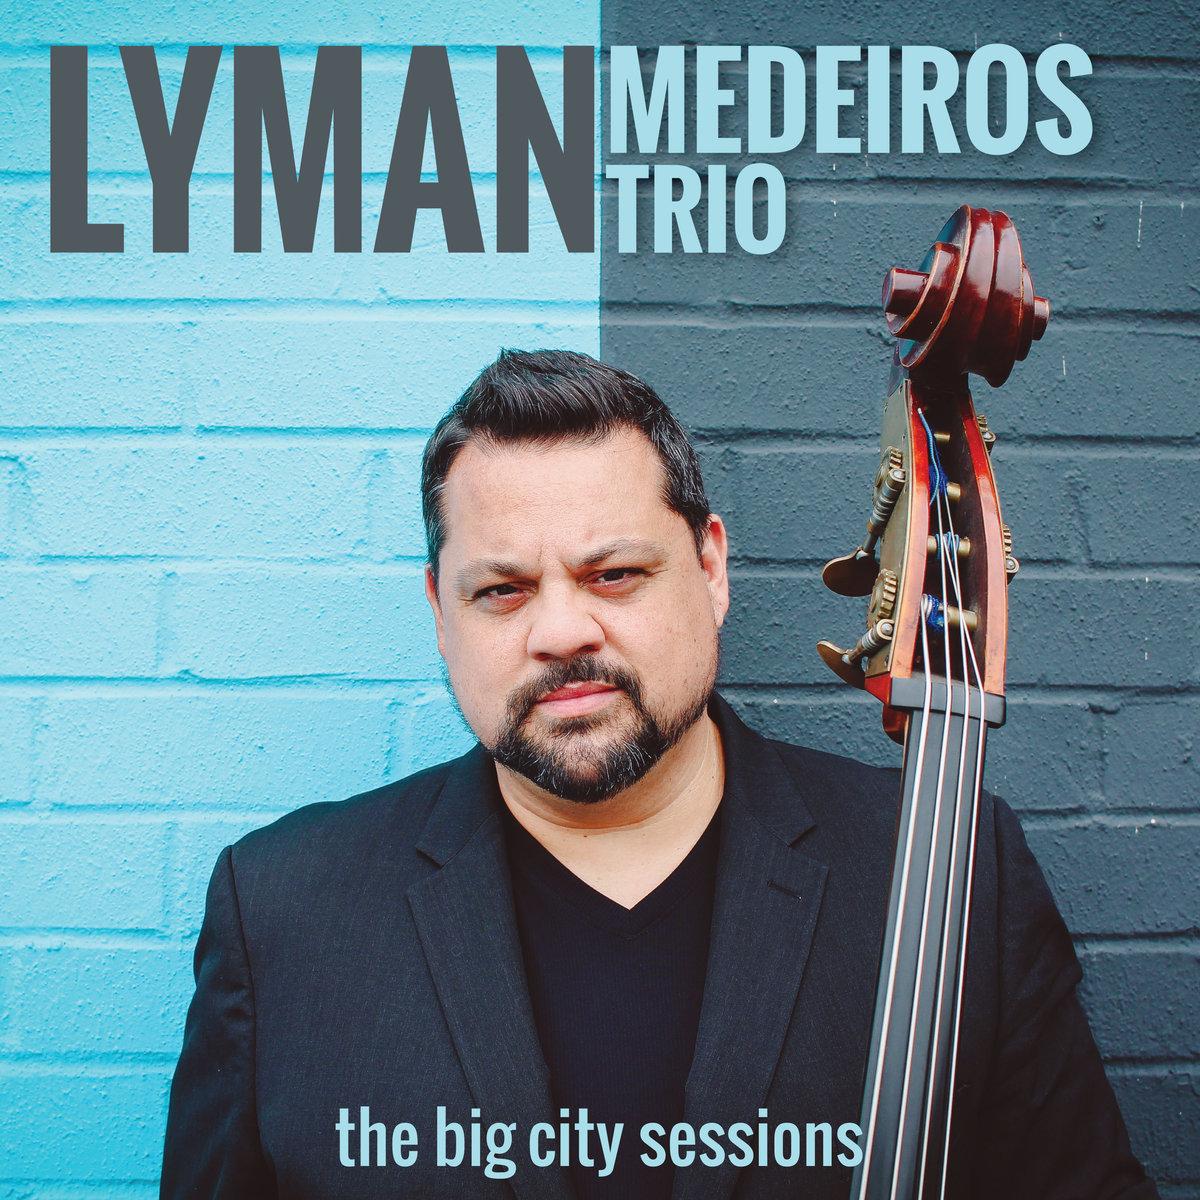 Dave Damiani w/ Lyman Medeiros Trio - The Grove